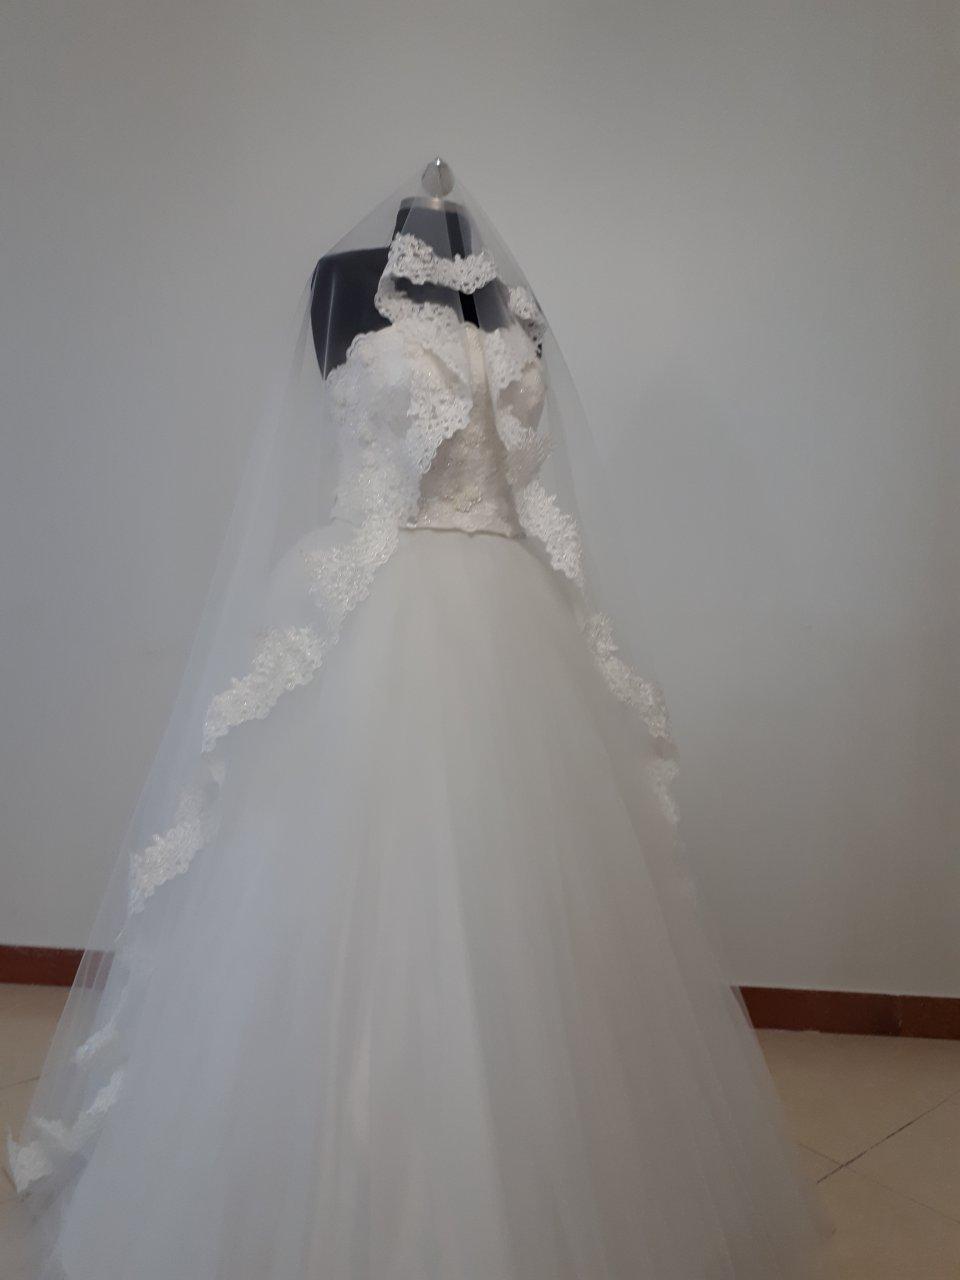 لباس عروس مدل اسکارلت کد 2